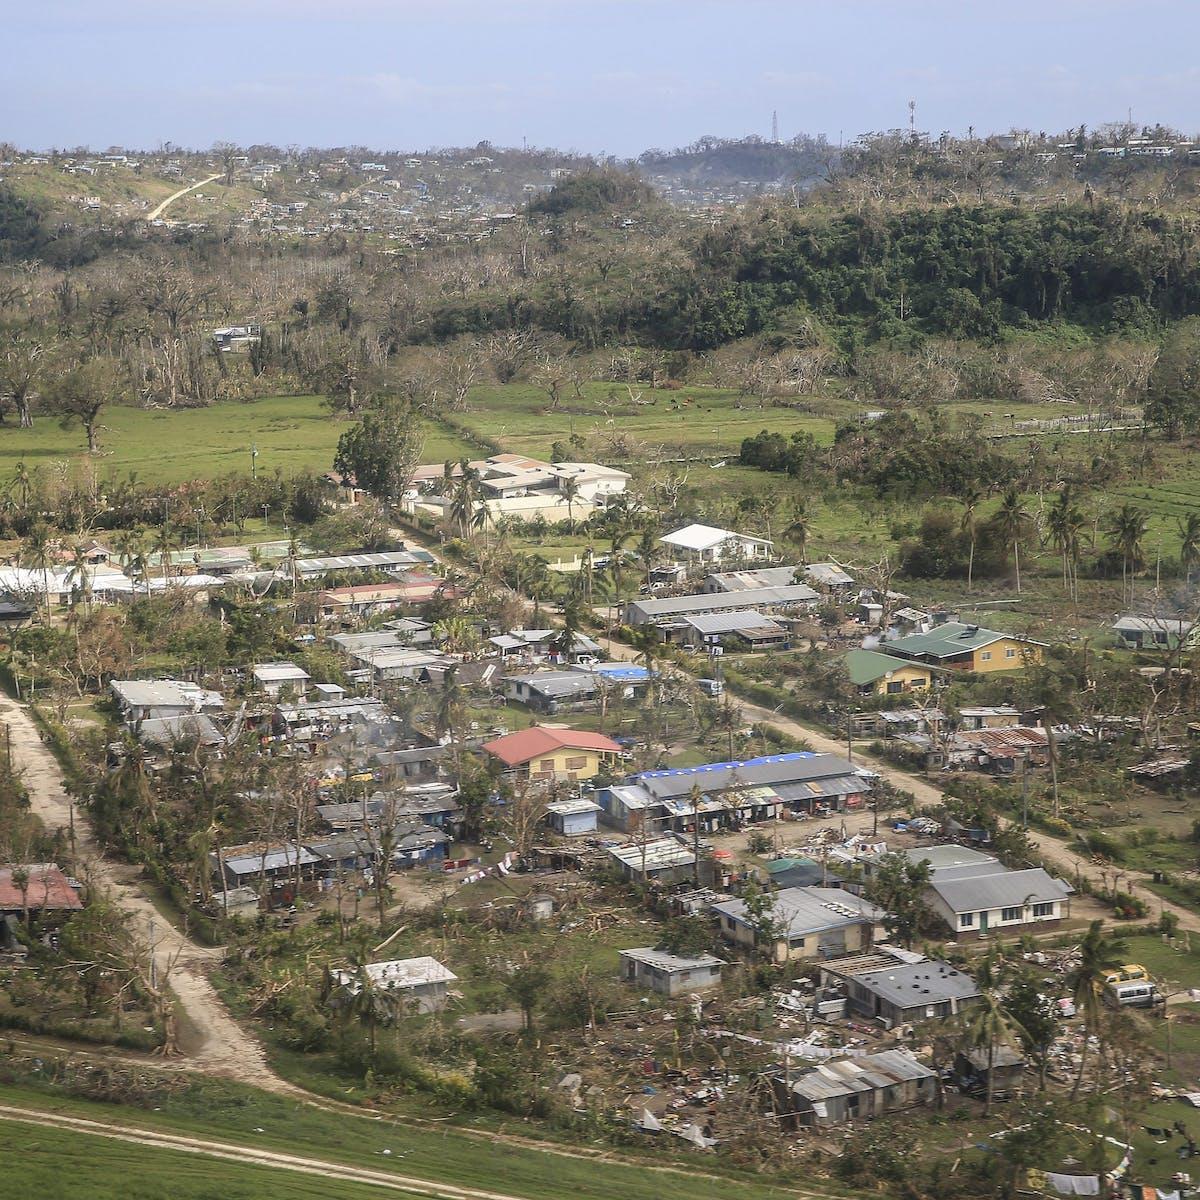 Human Activities Influence Natural Disasters - blogger.com